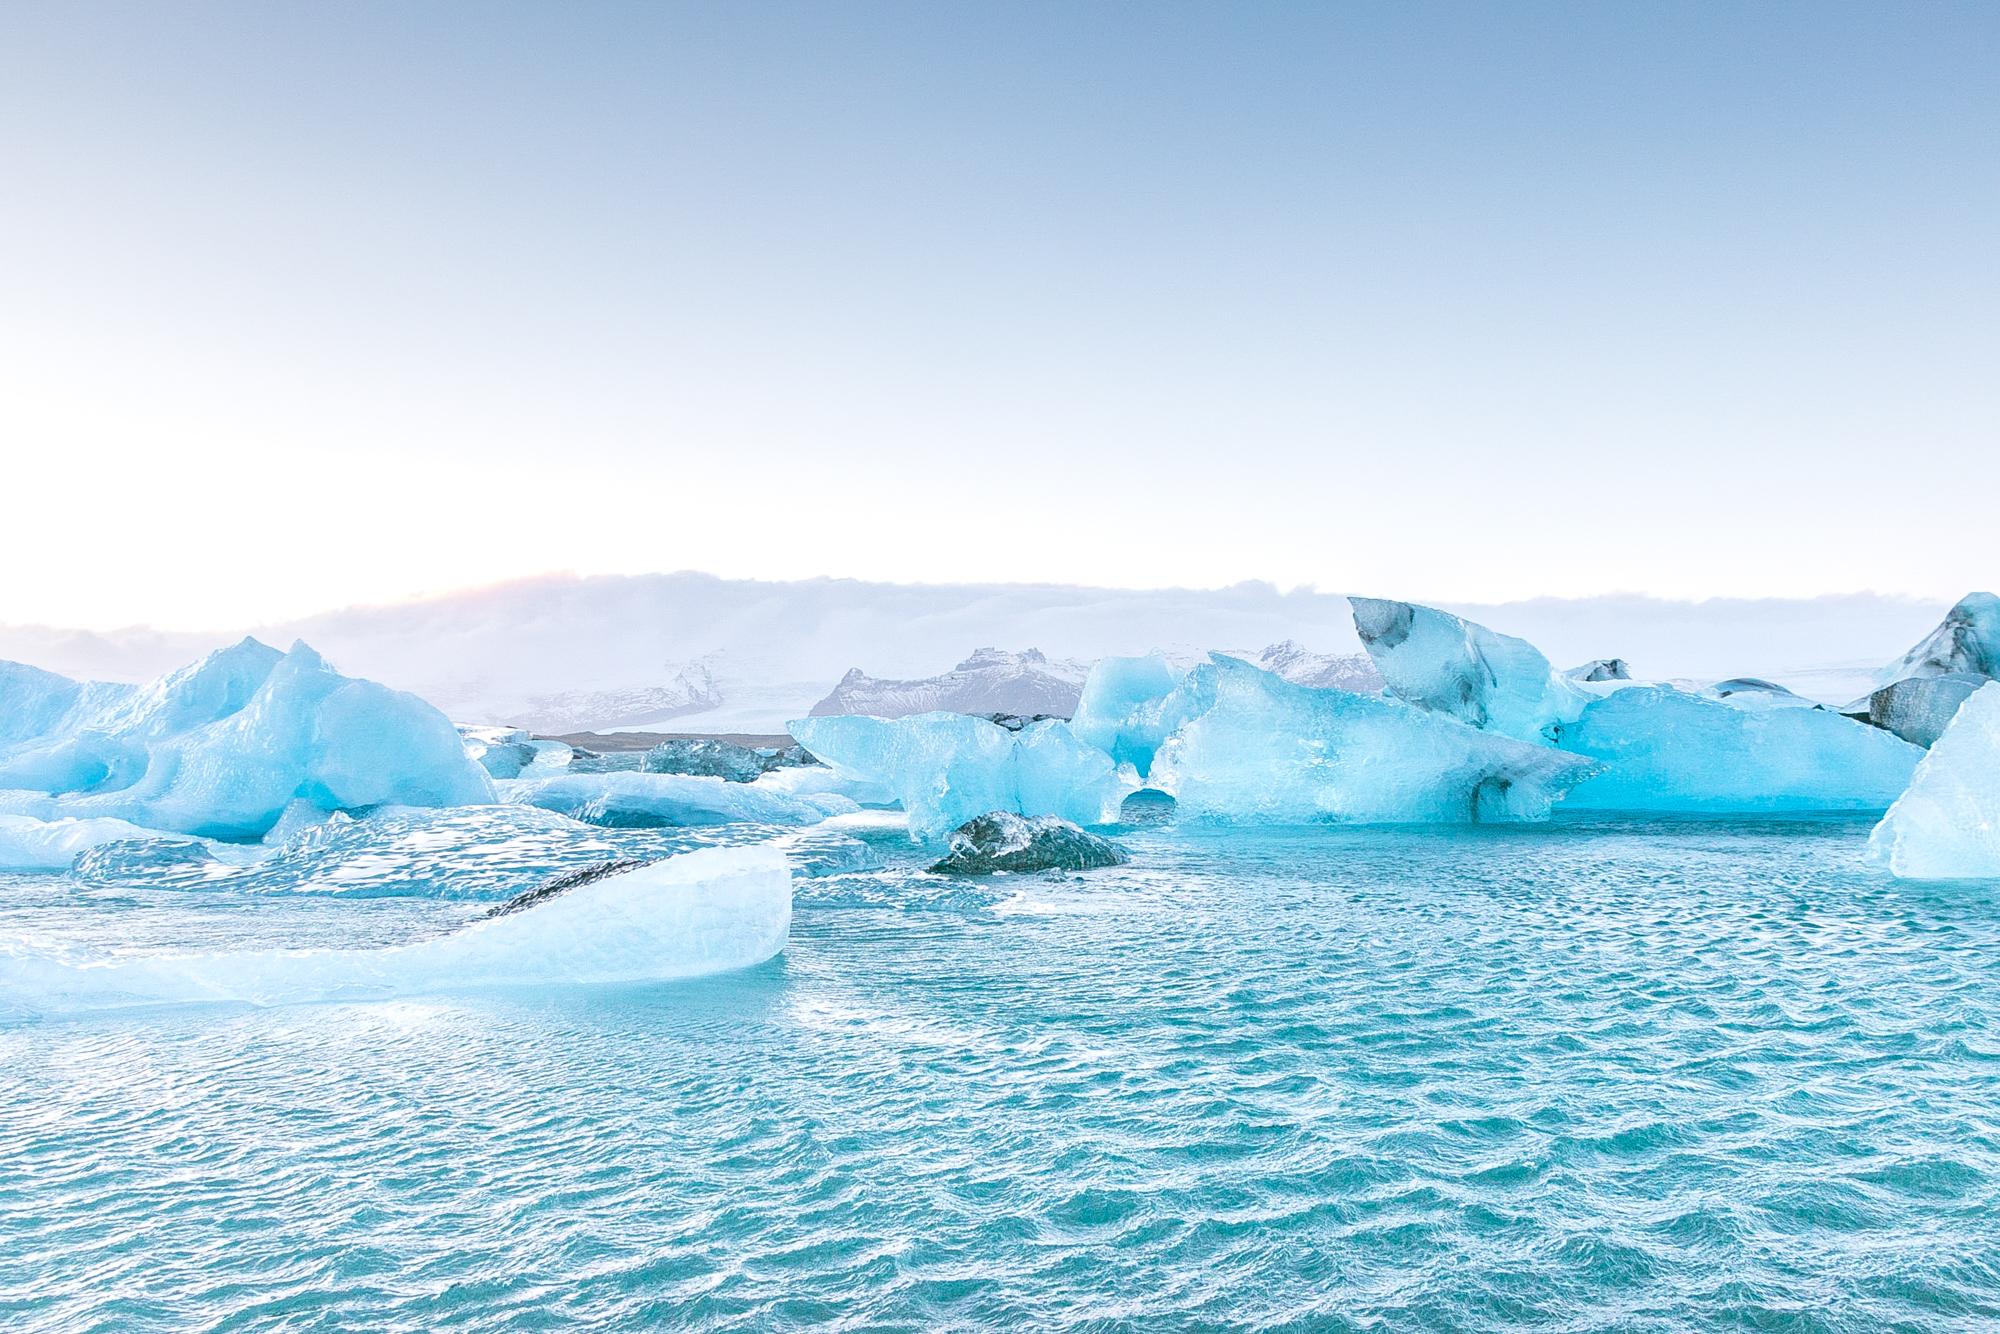 Landscape_photography_frozen-7.jpg